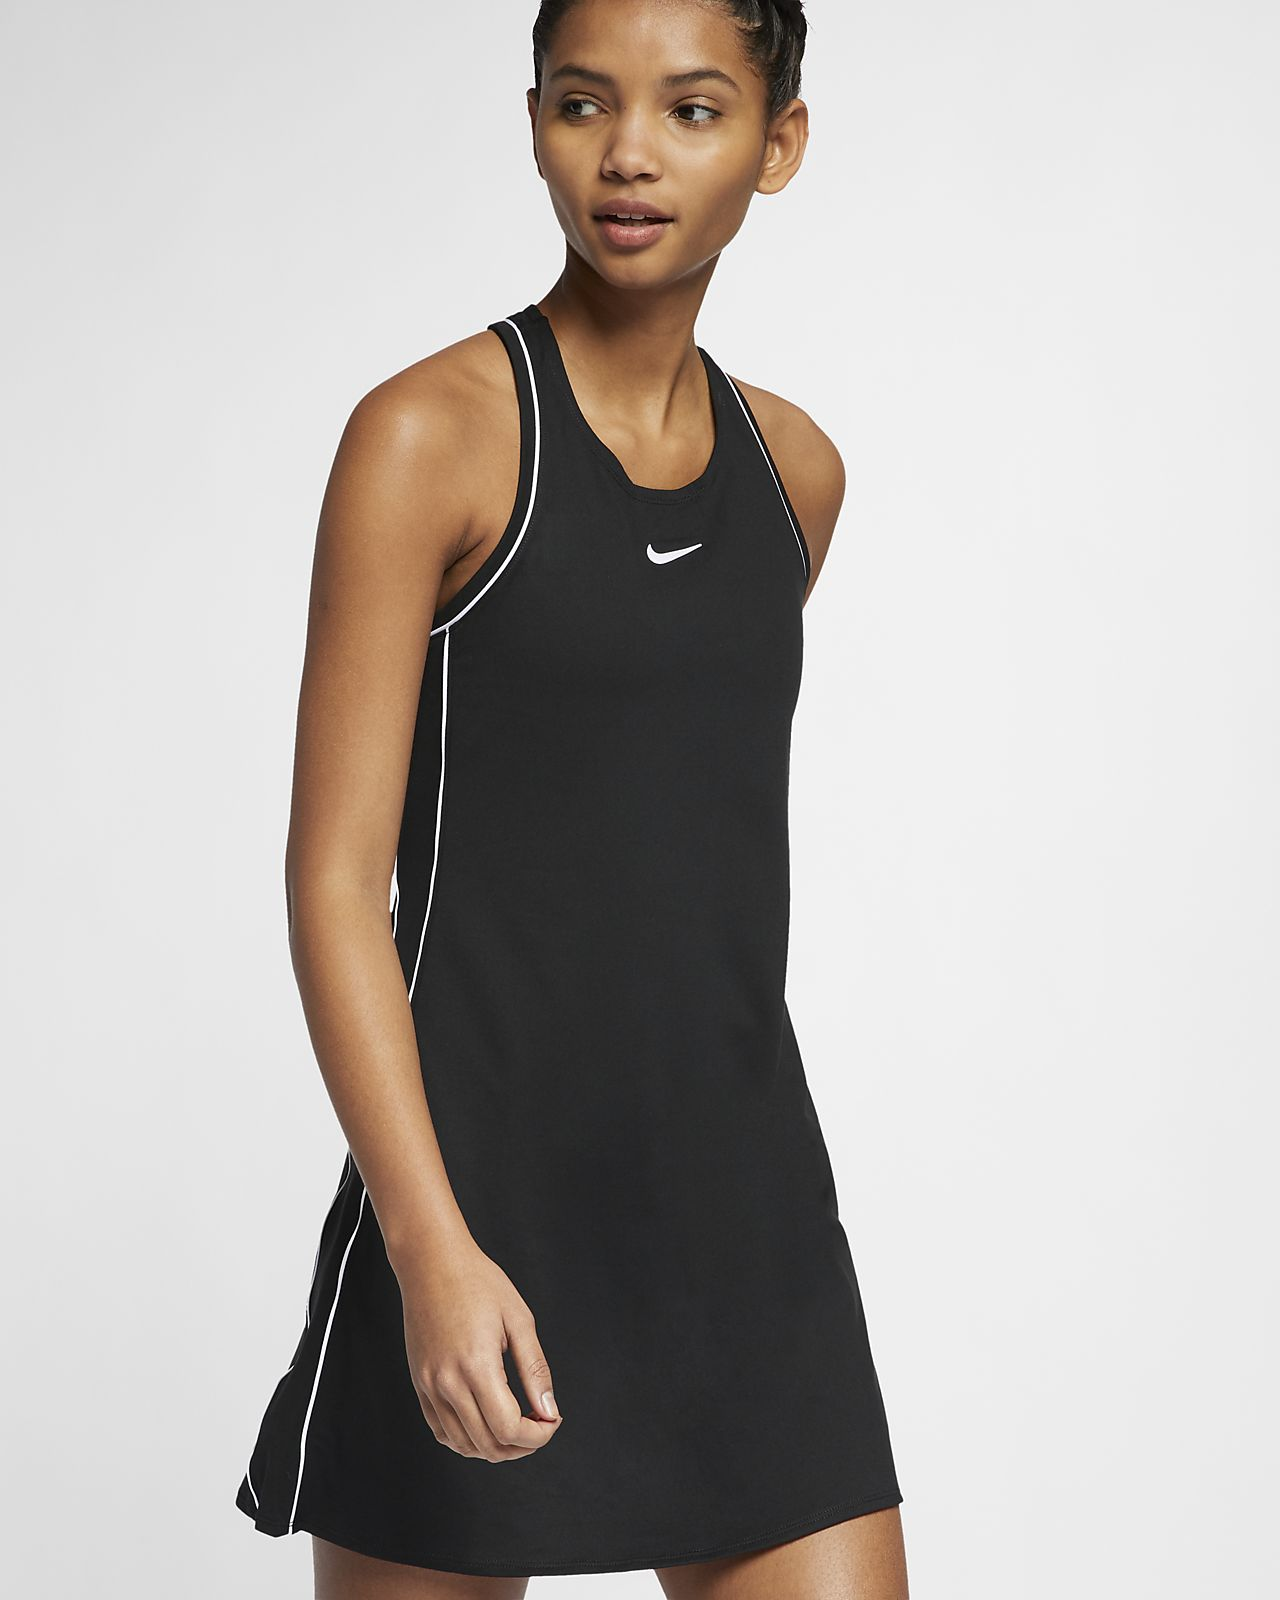 213126632e NikeCourt Dri-FIT Women's Tennis Dress. Nike.com